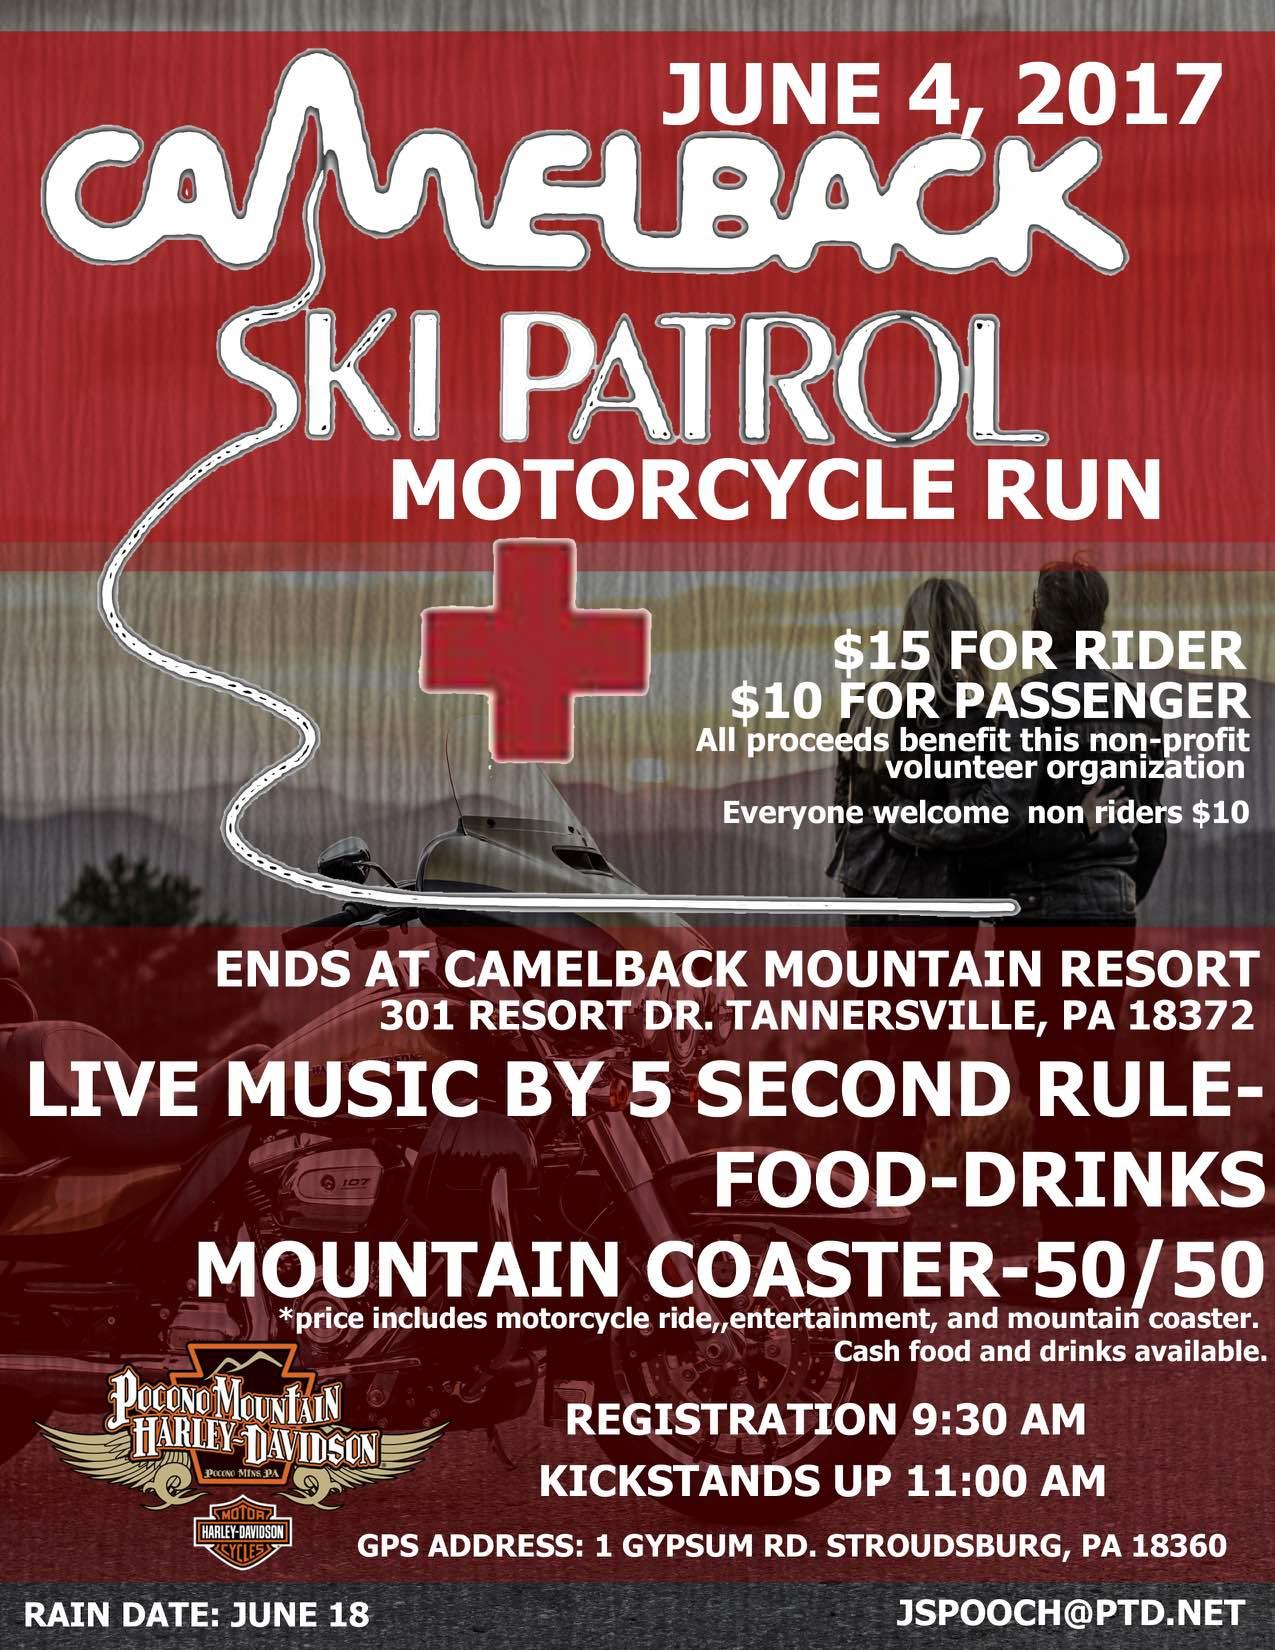 Camelback Ski Patrol Motorcycle Run